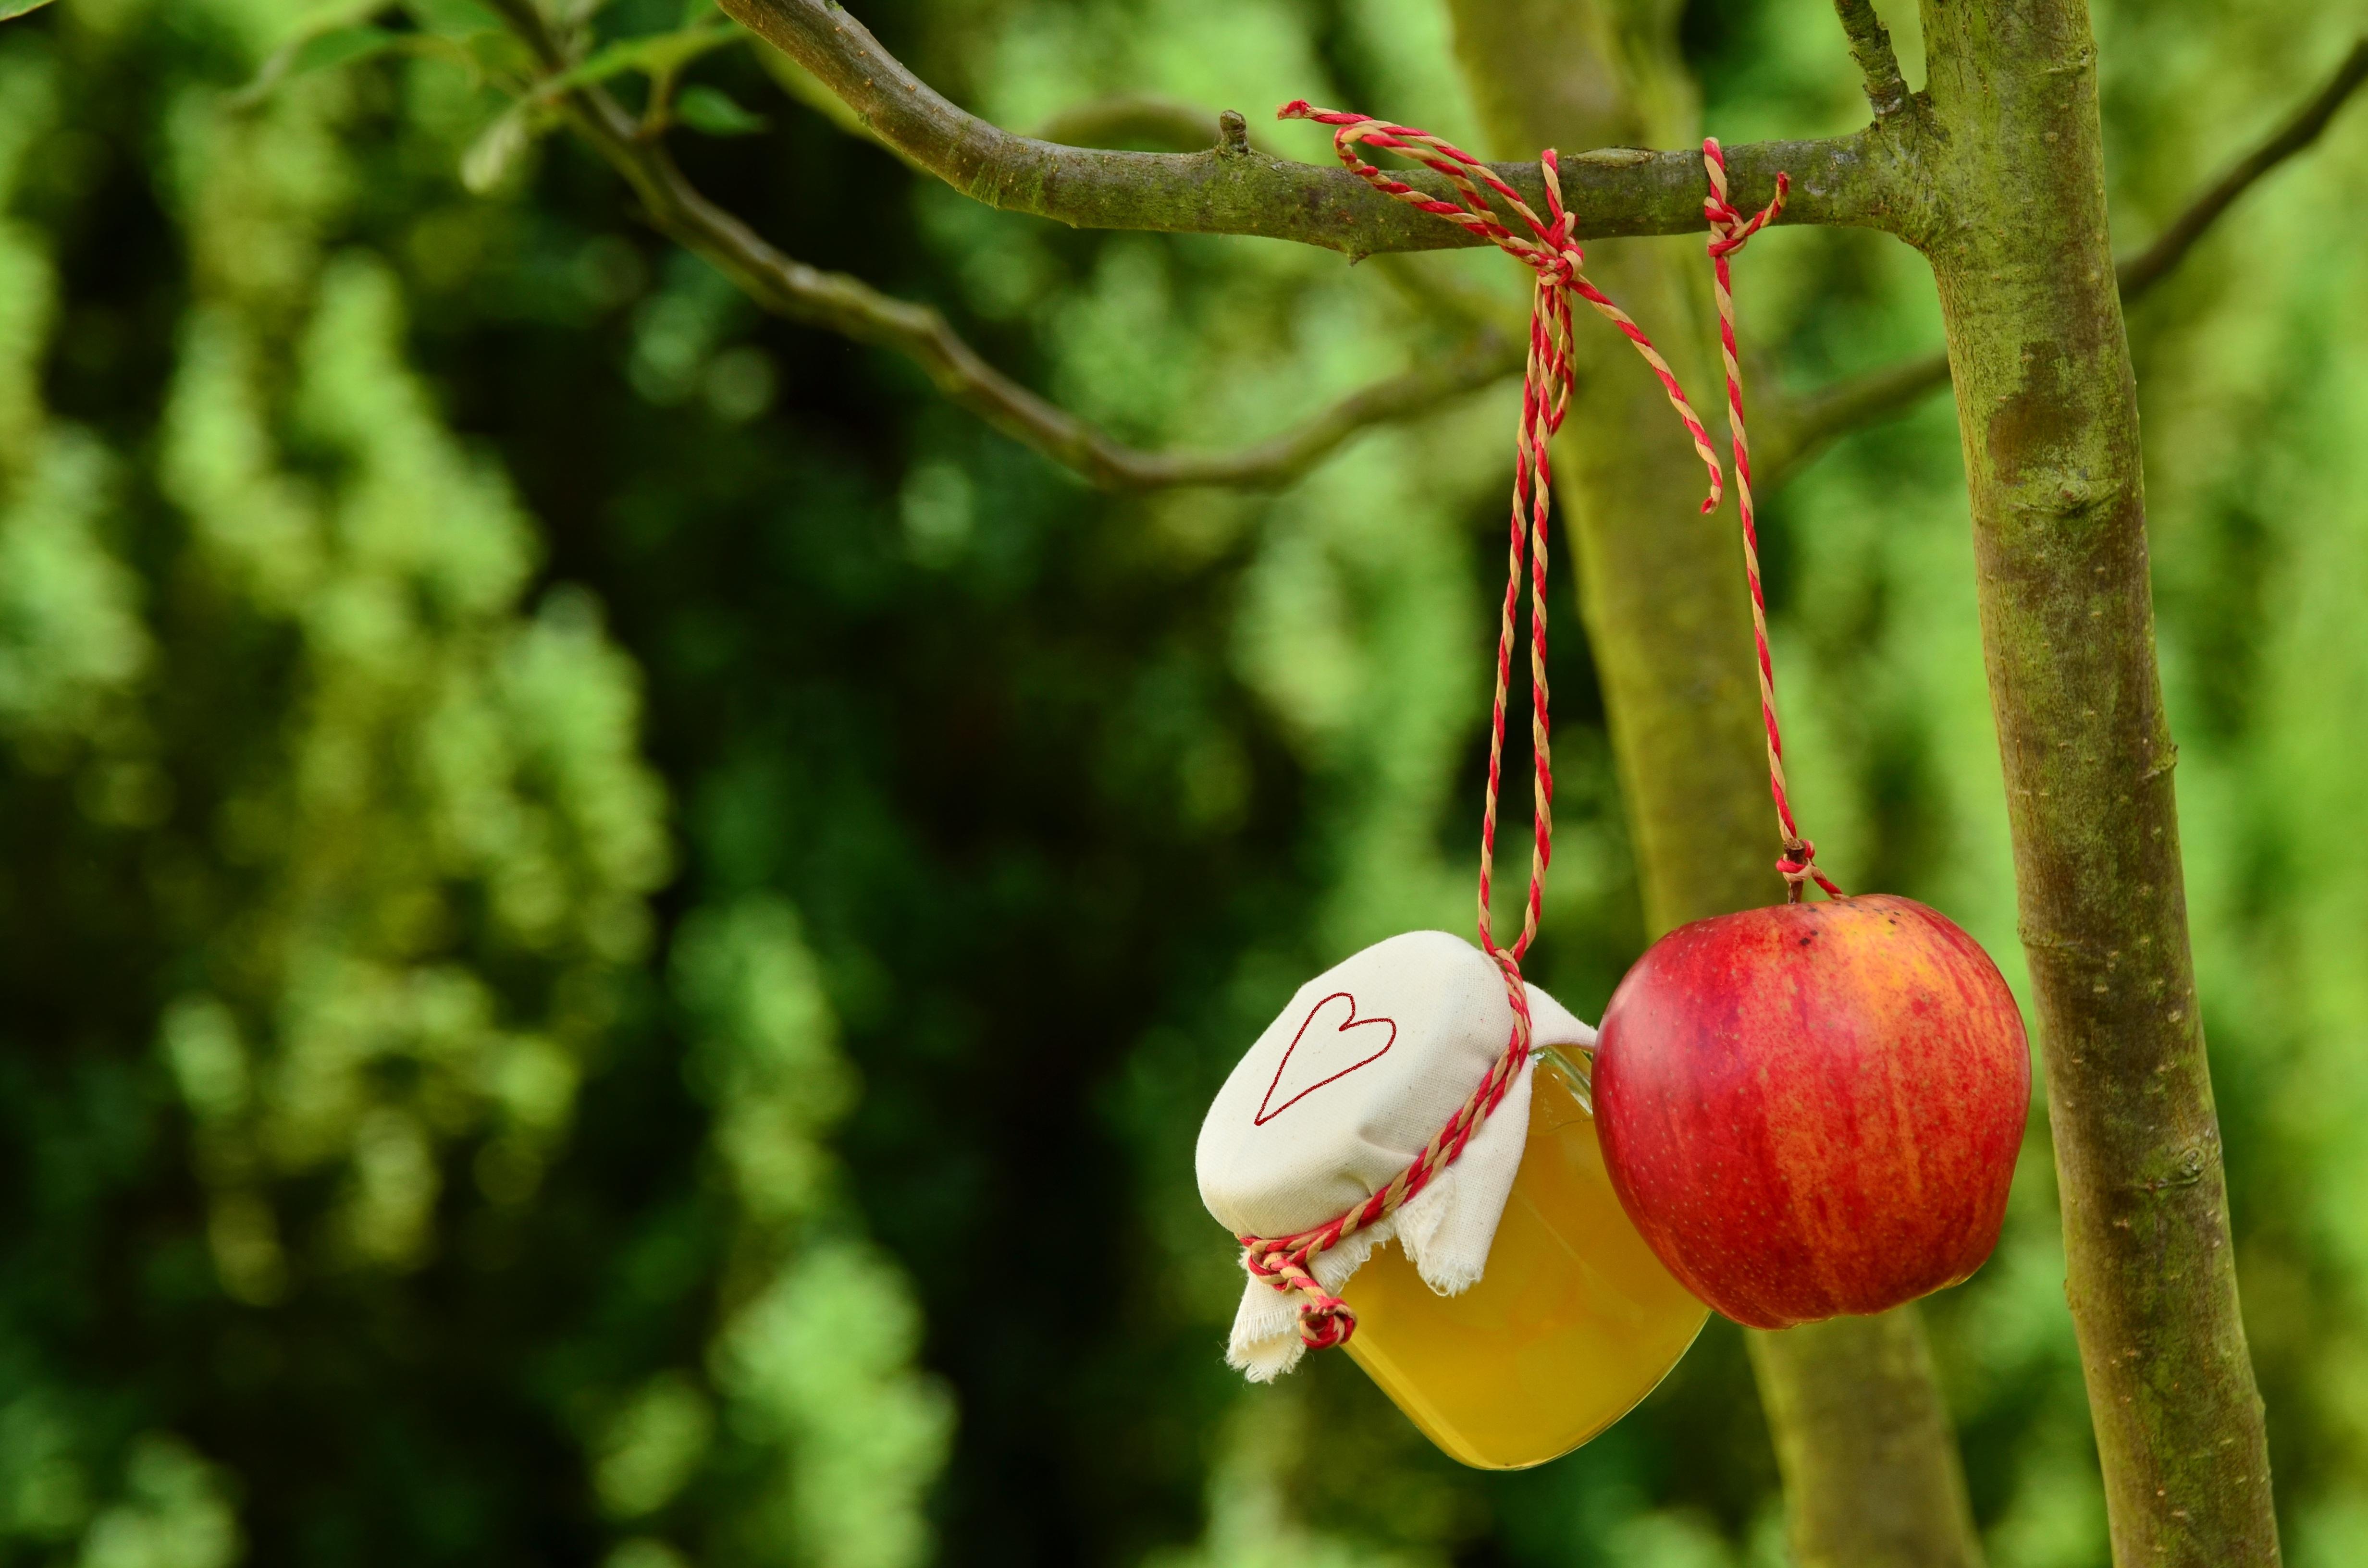 apple hanging next to cider jar